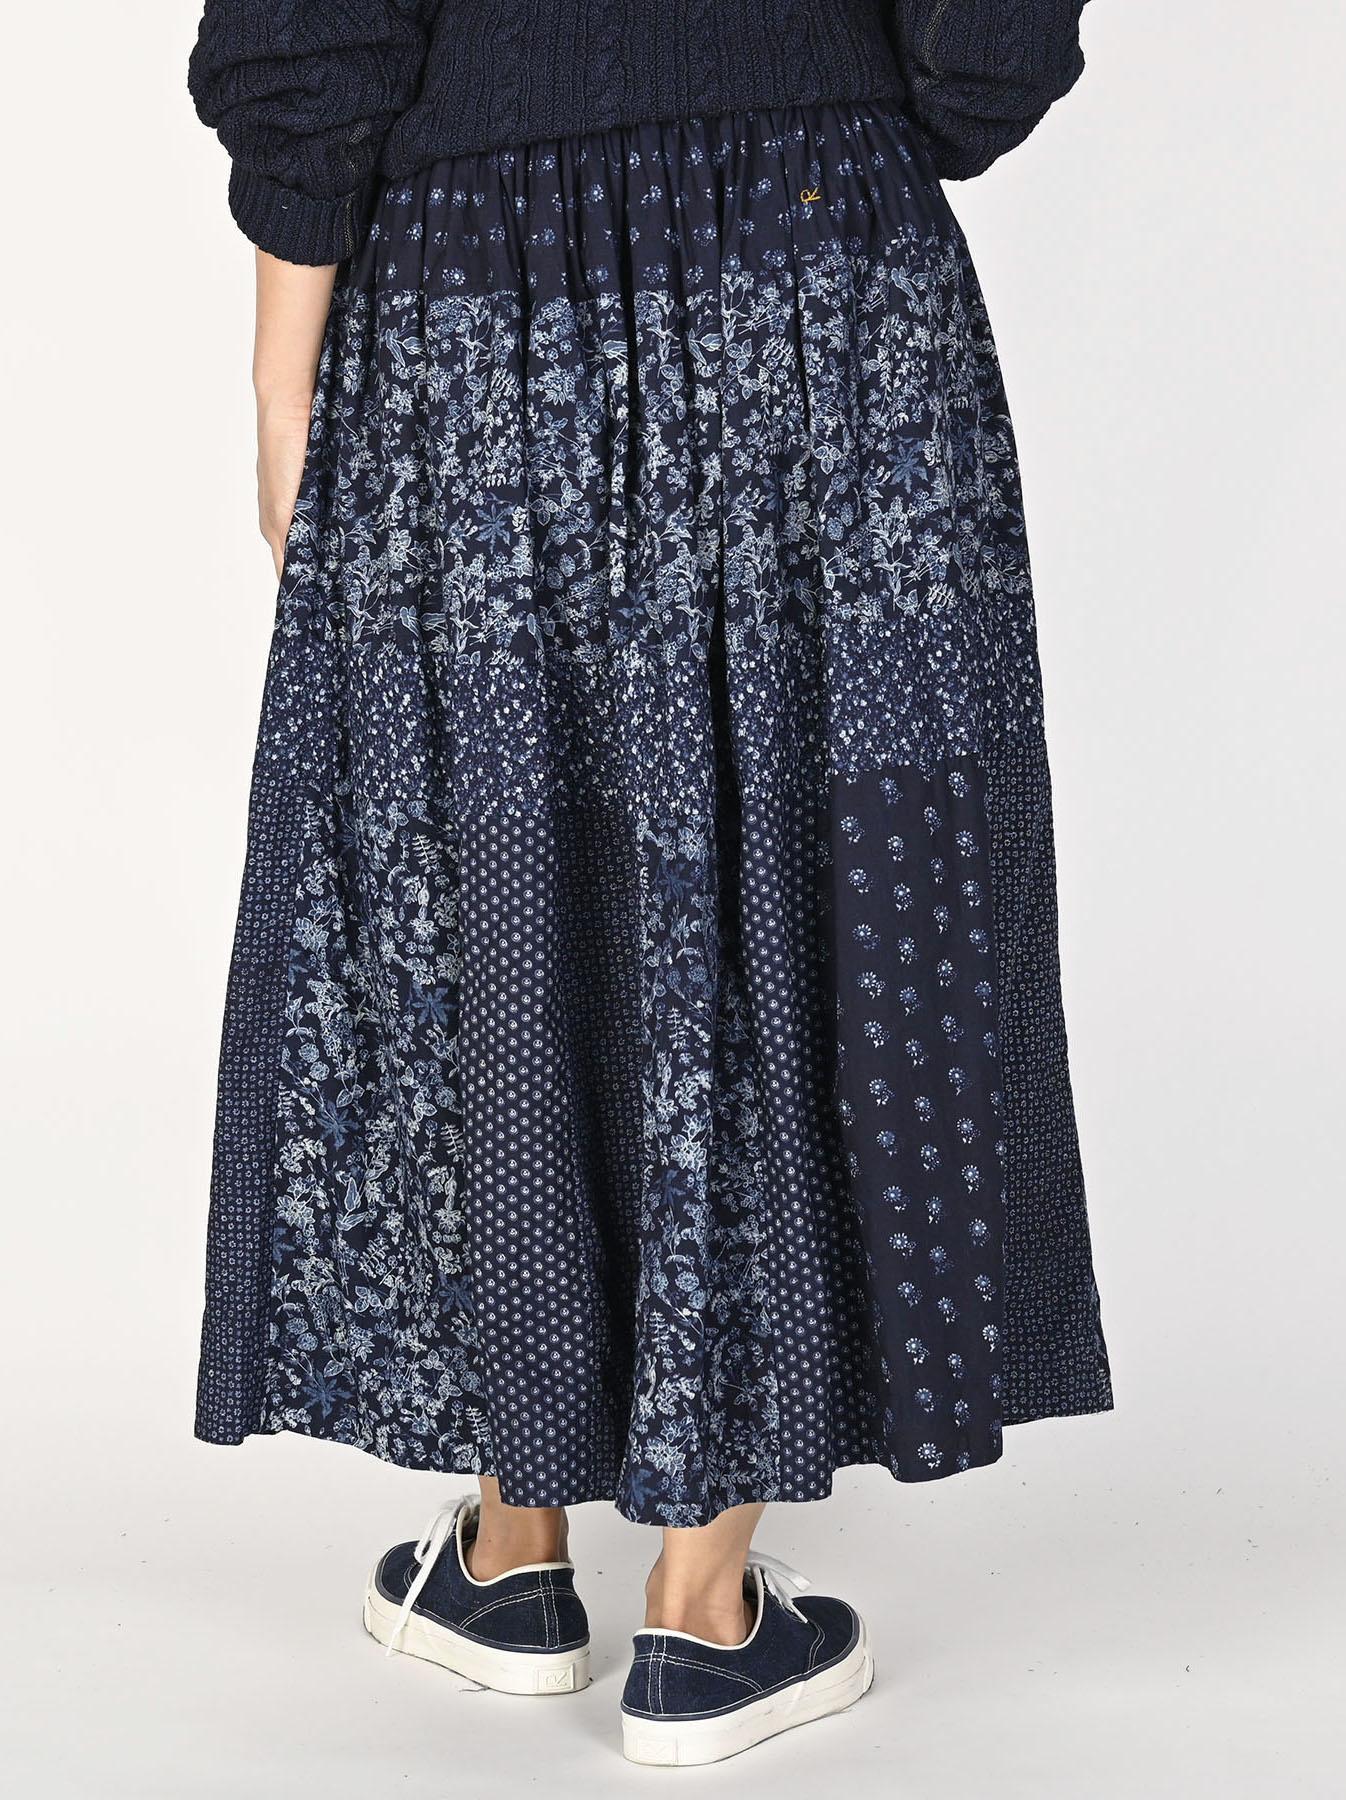 Indigo Tappet Flower Patchwork Skirt-4